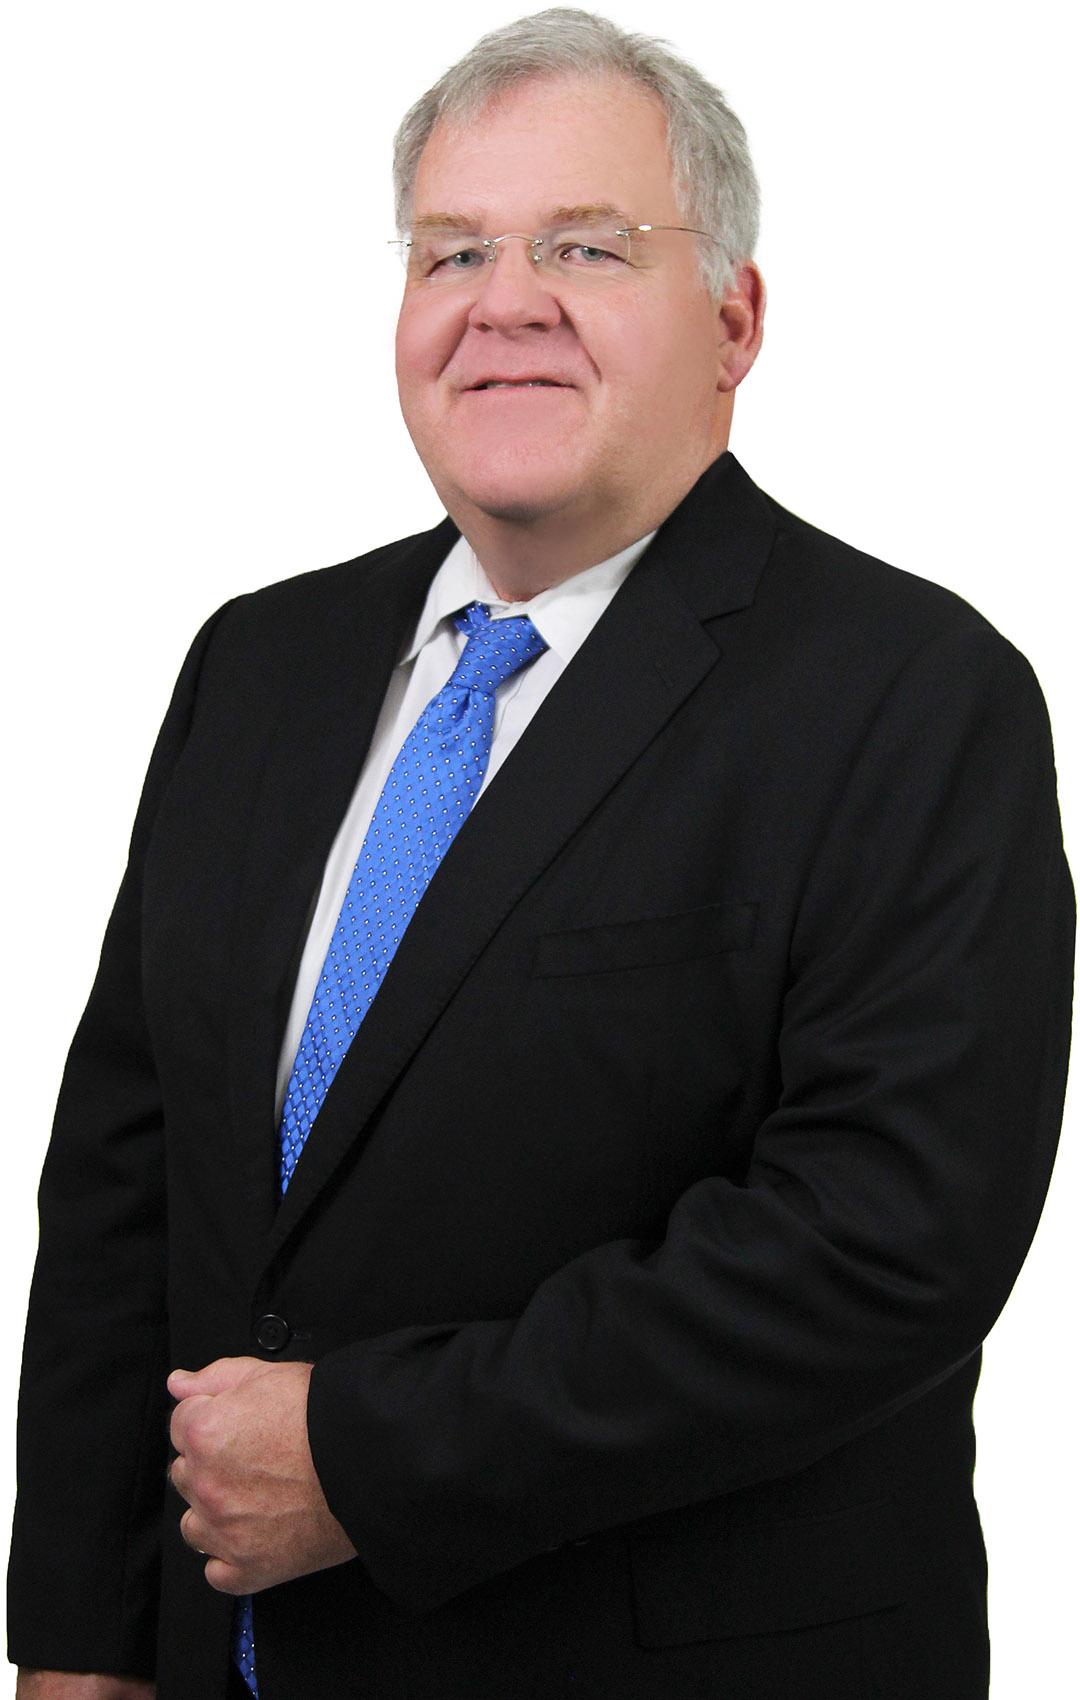 Thomas F. Moran